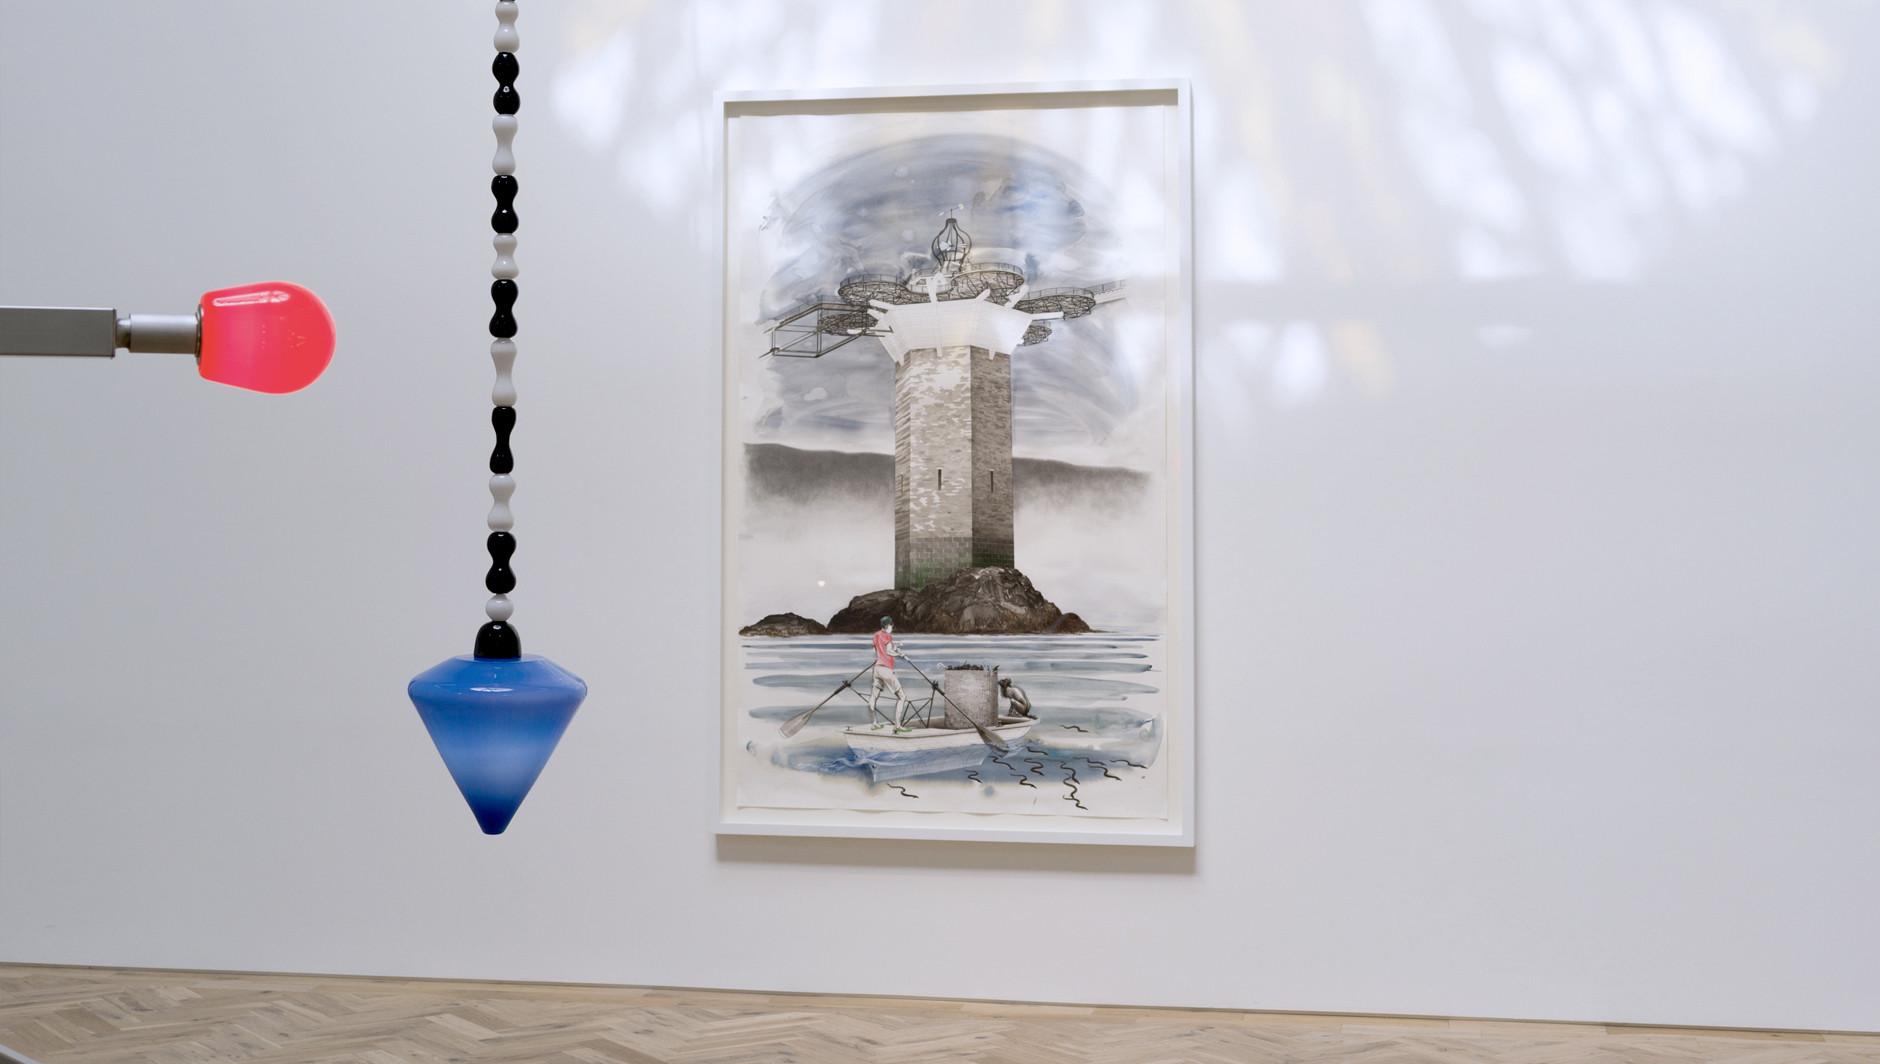 Charles Avery: The Gates of Onomatopoeia Ingleby Gallery, Edinburgh, 27 April - 13 July, 2019